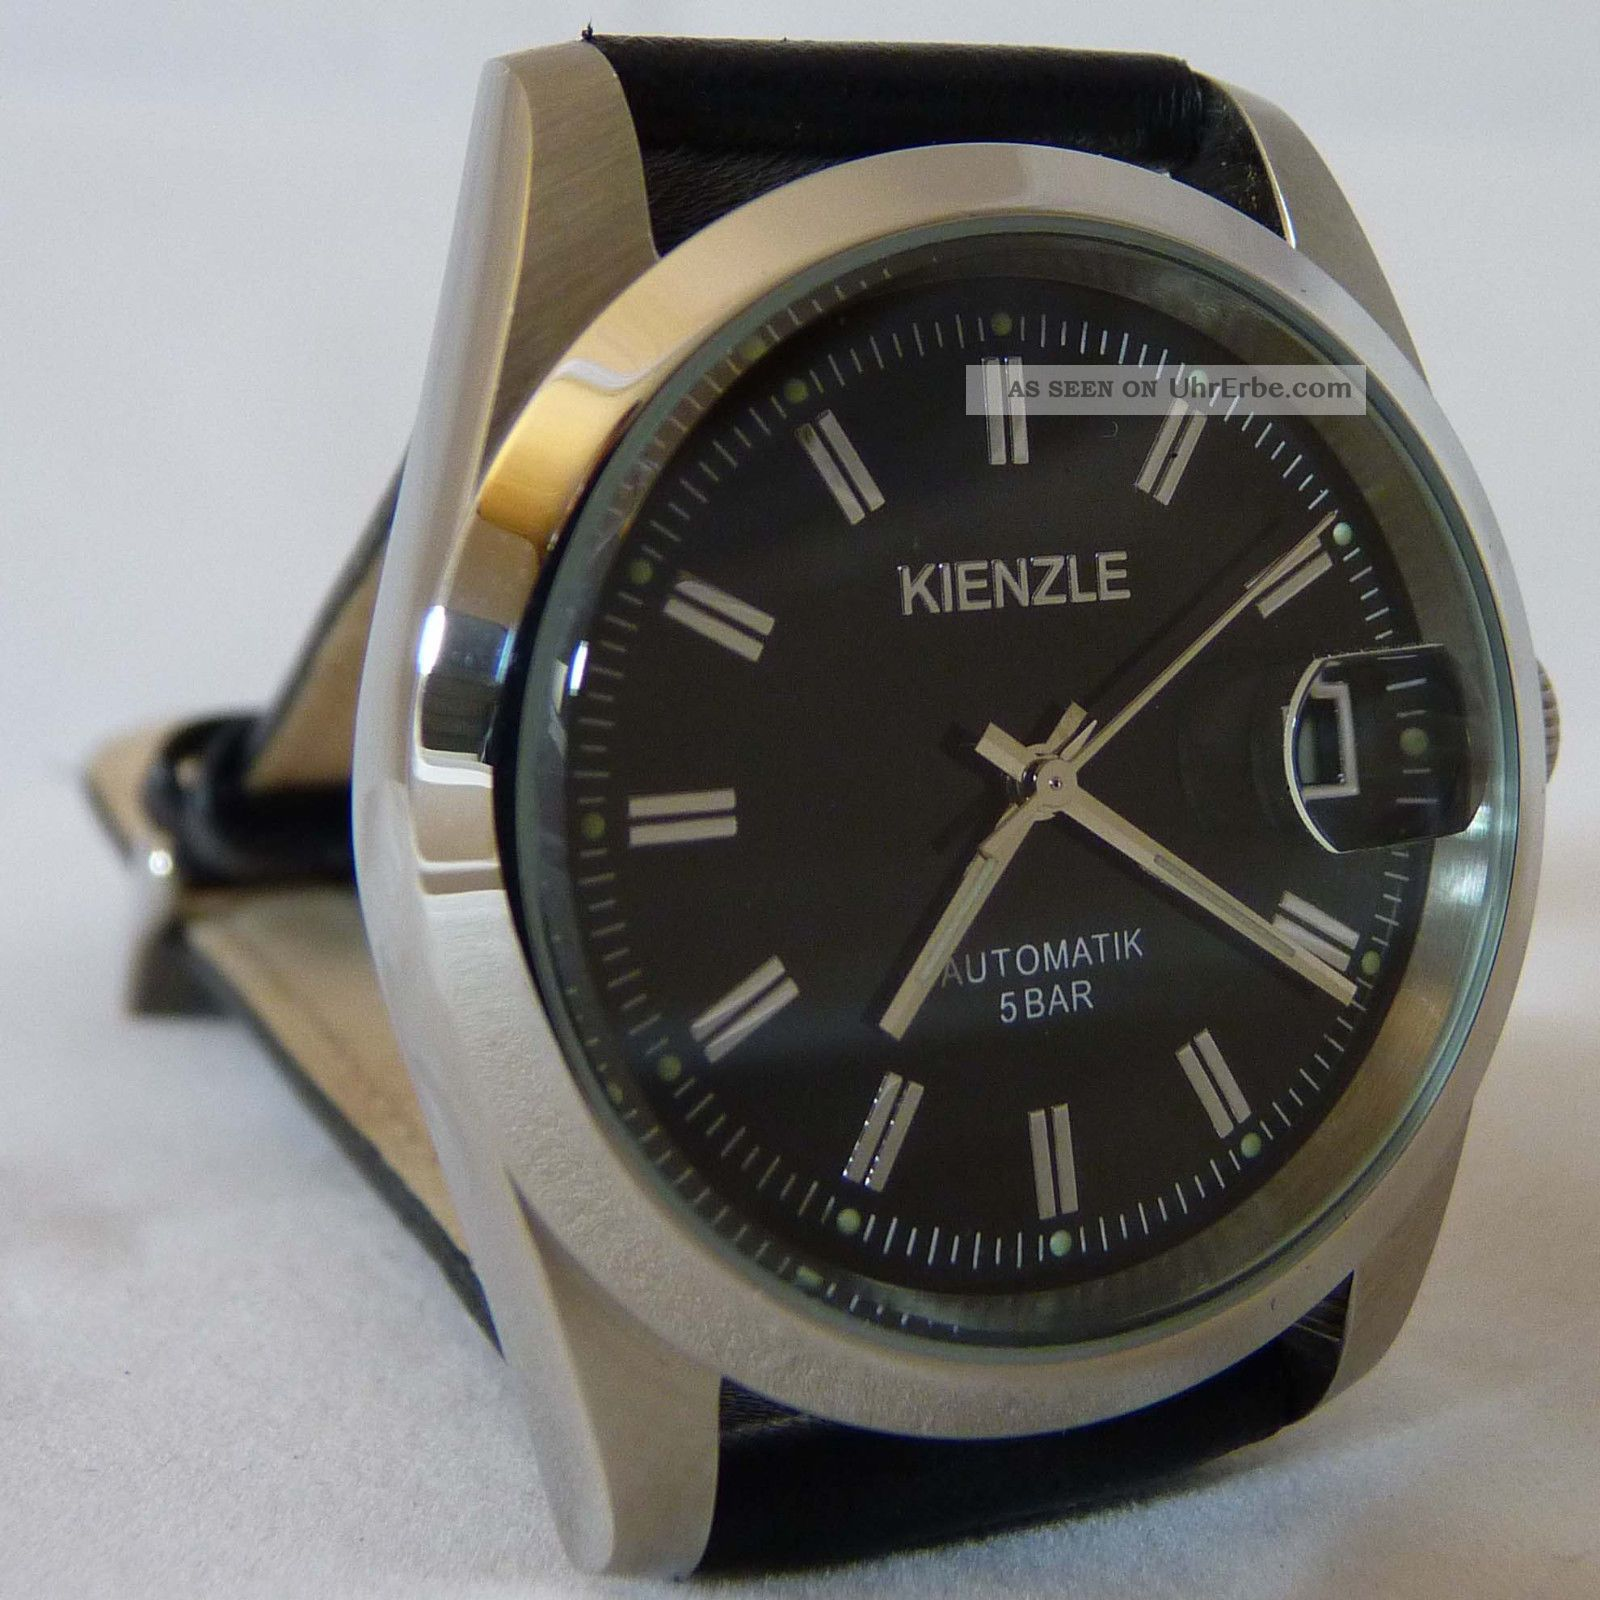 Kienzle Damen Armbanduhr Automatik Miyota Mit Lederarmband Und Datumsanzeige Armbanduhren Bild